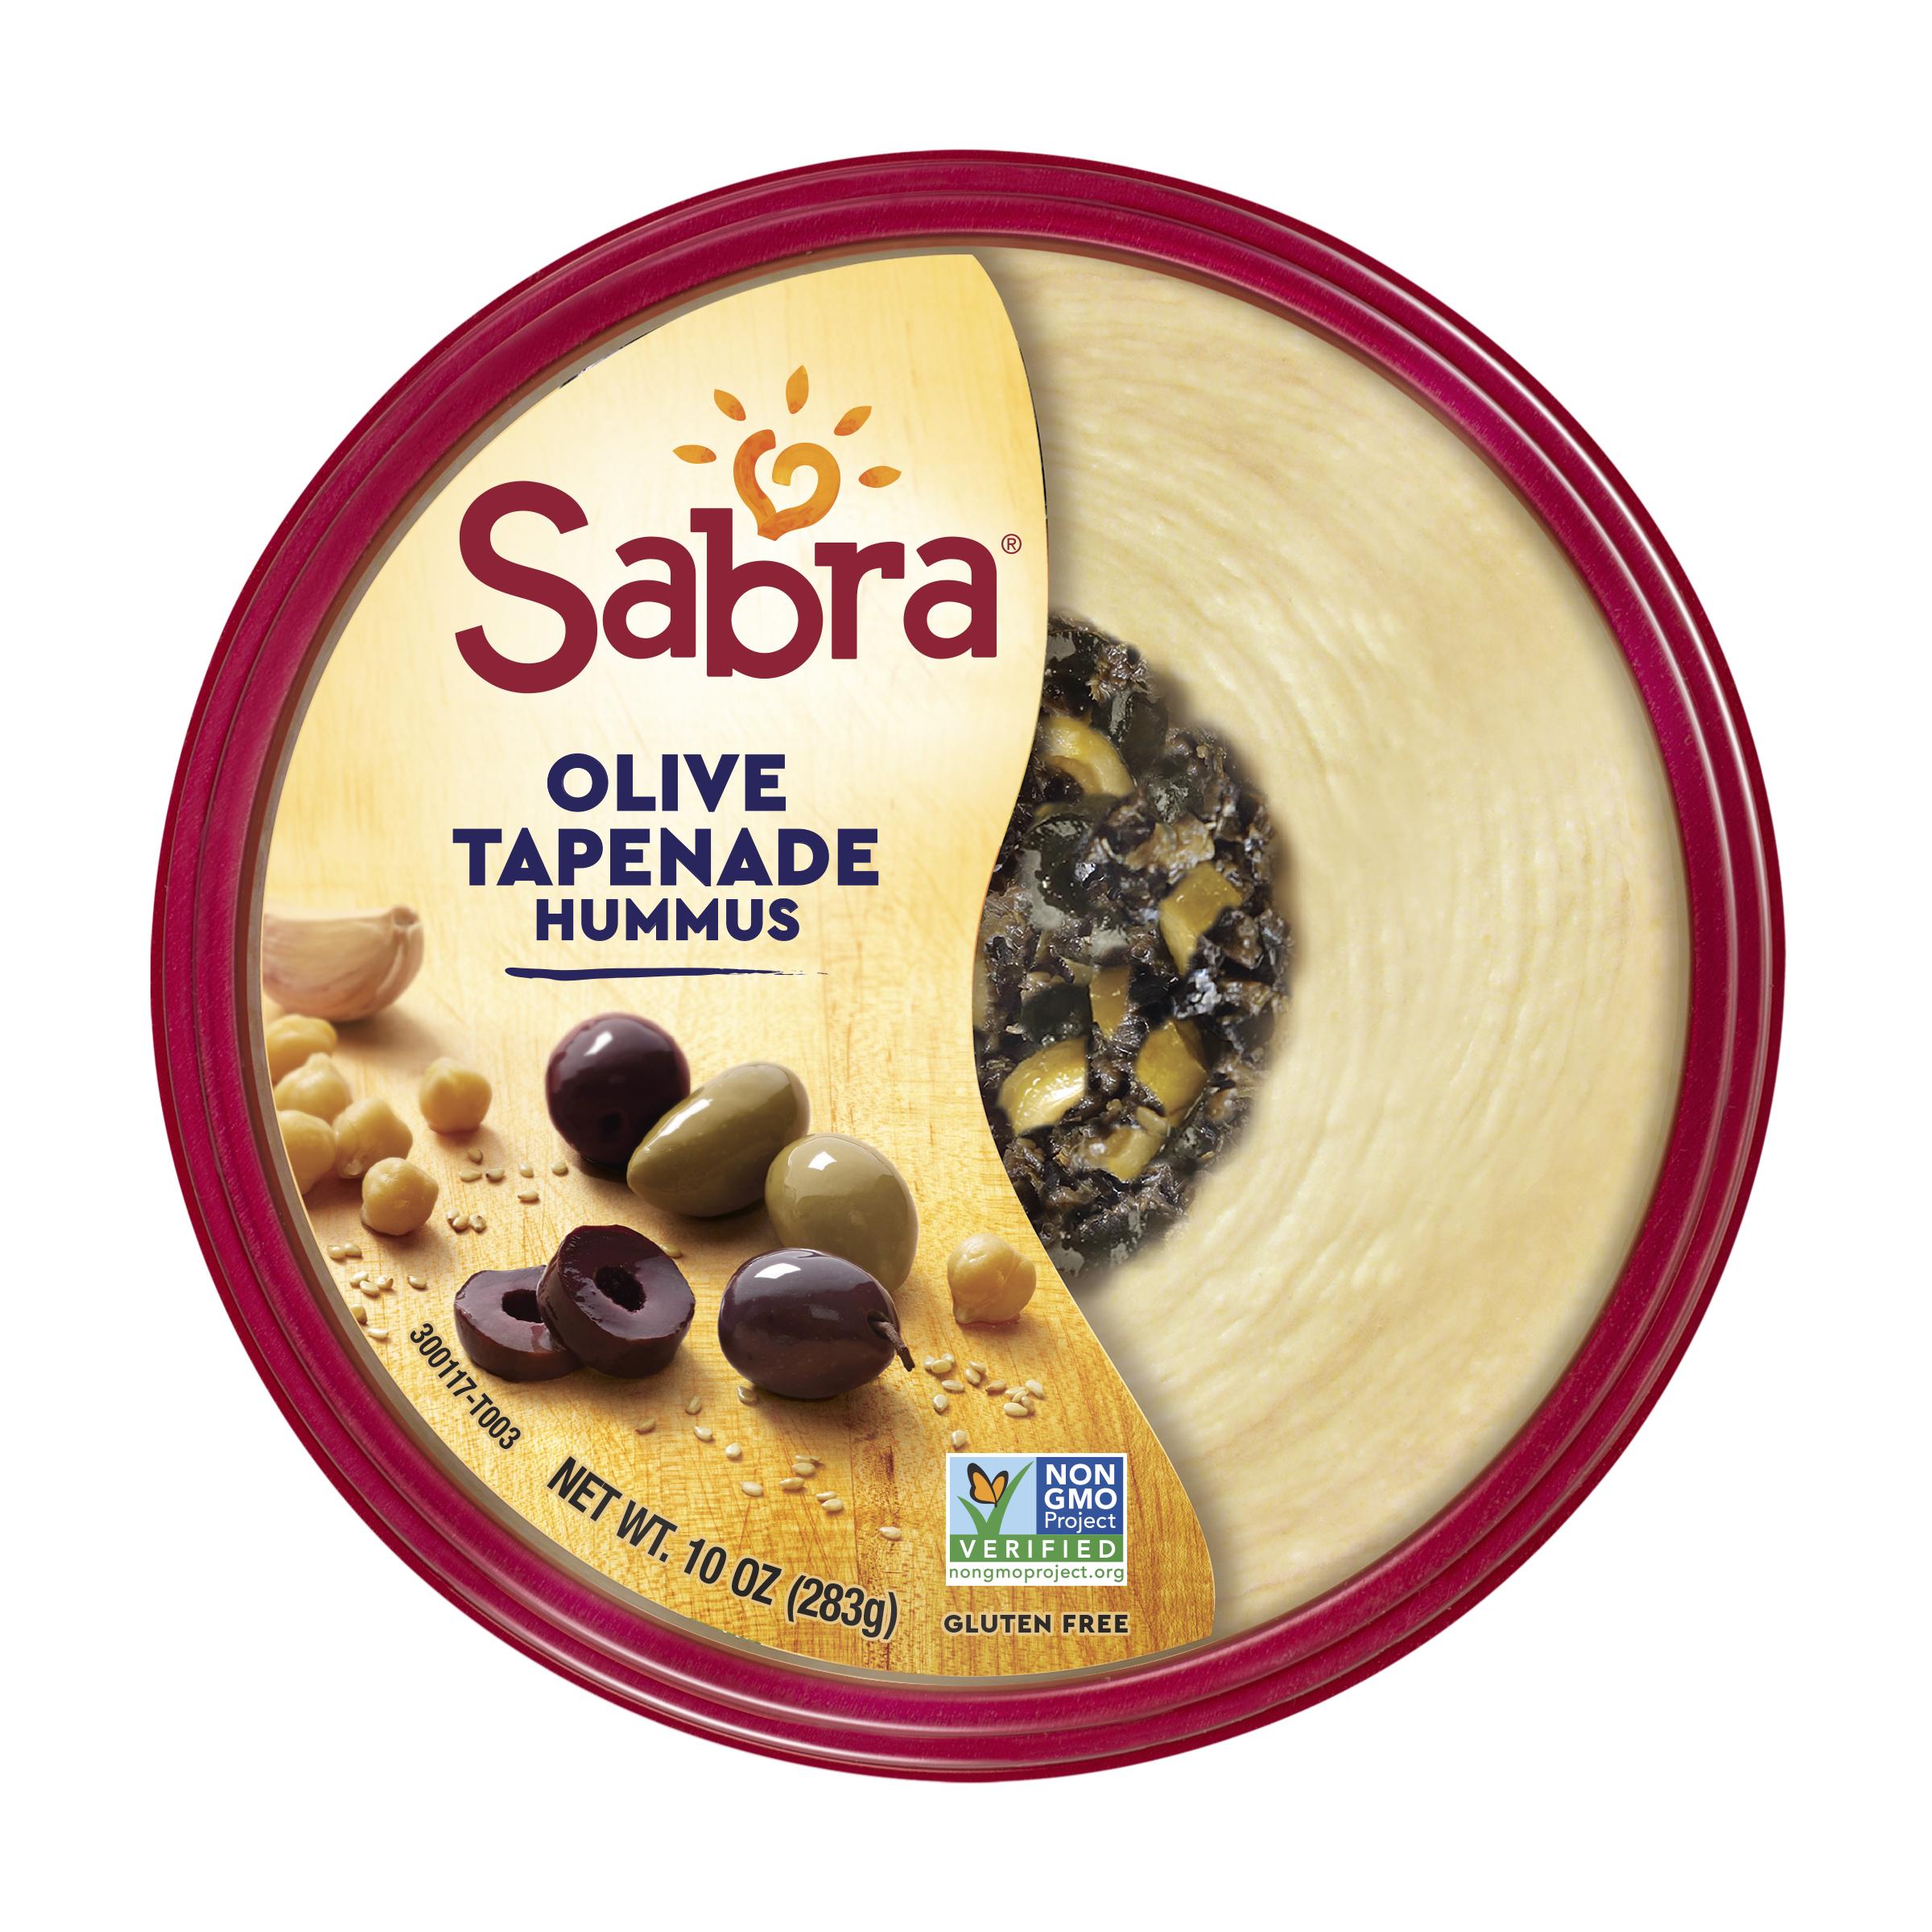 Sabra Olive Tapenade Hummus, 10 oz